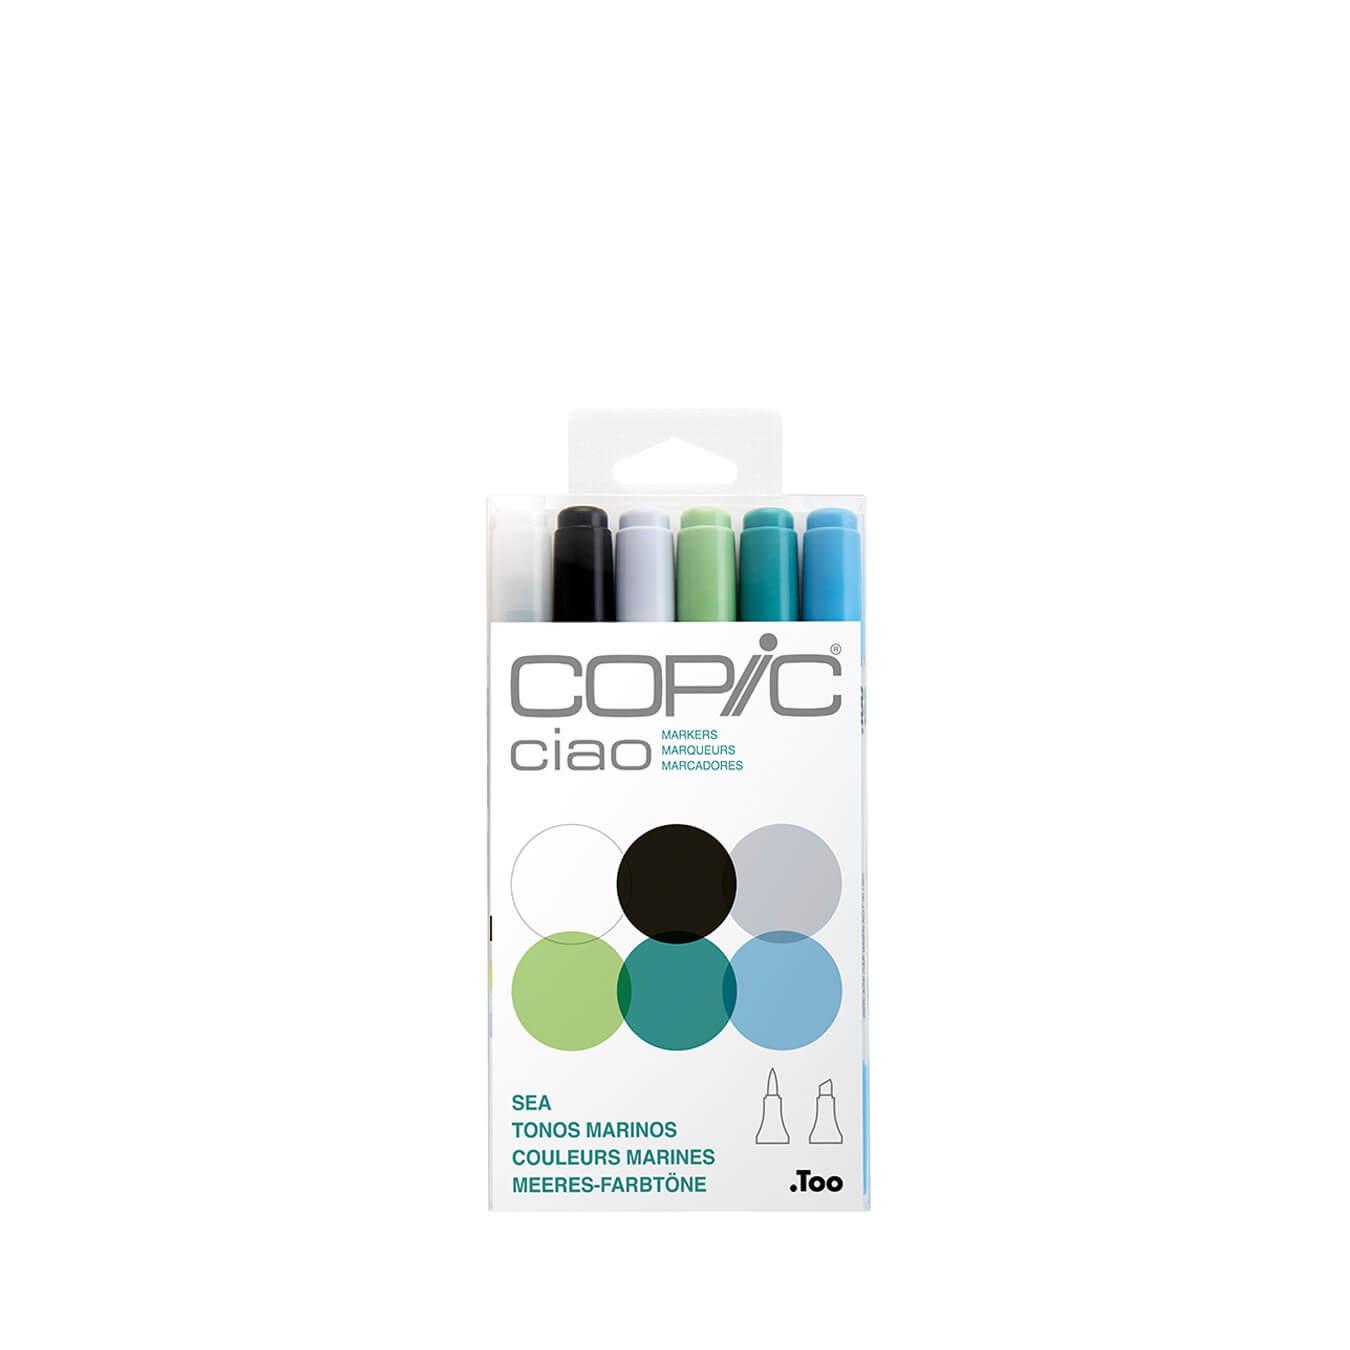 Copic Ciao 6 colors set Sea